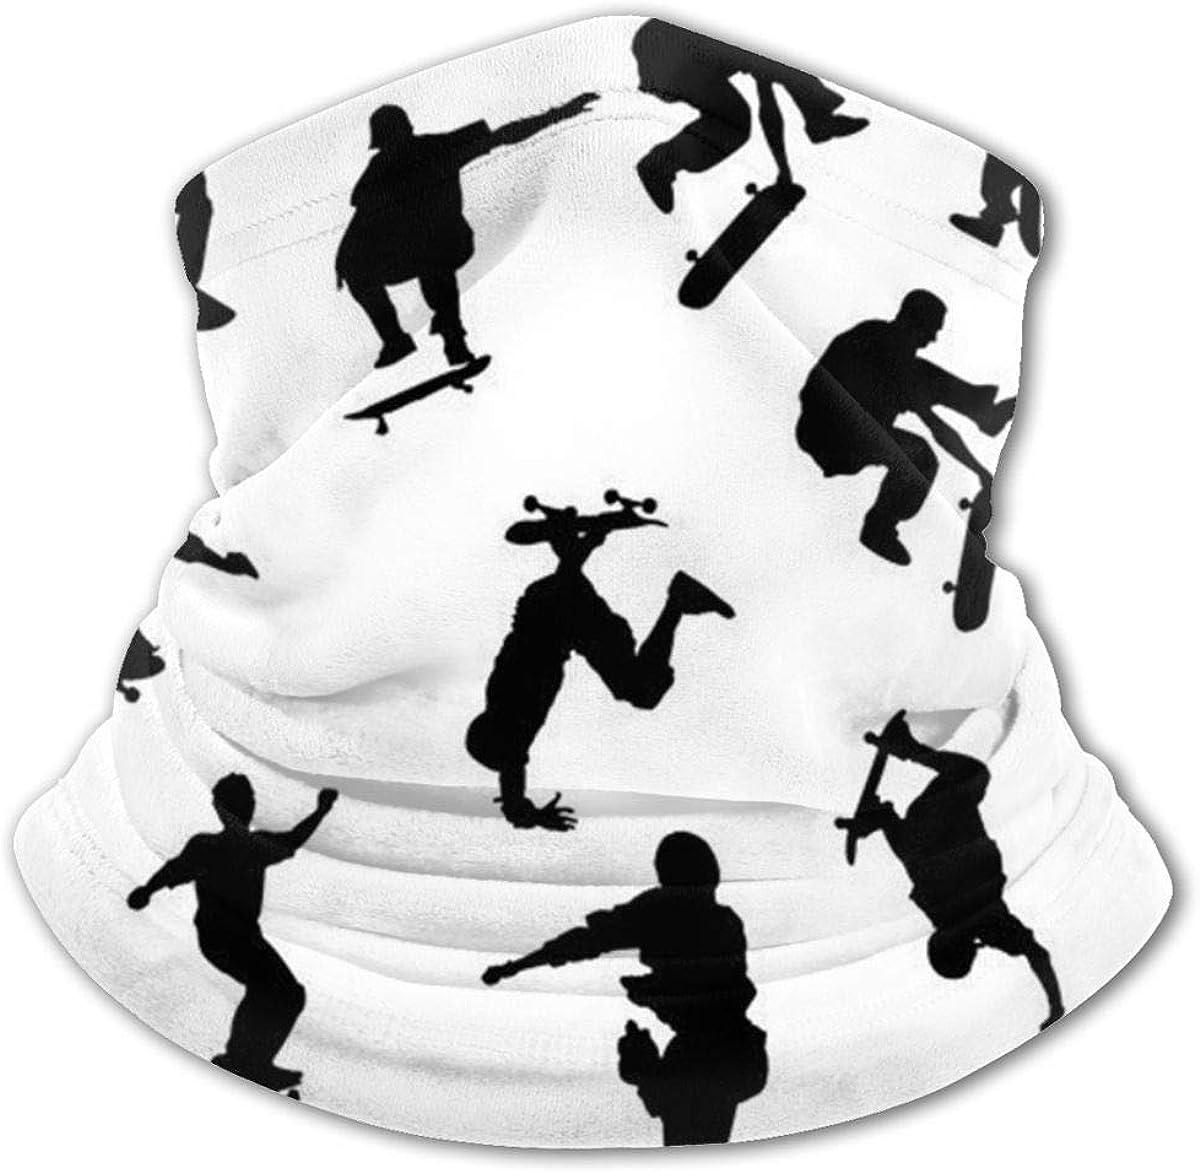 Skateboarders Headwear For Girls And Boys, Head Wrap, Neck Gaiter, Headband, Tenn Fishing Mask, Magic Scarf, Tube Mask, Face Bandana Mask For Camping Running Cycling